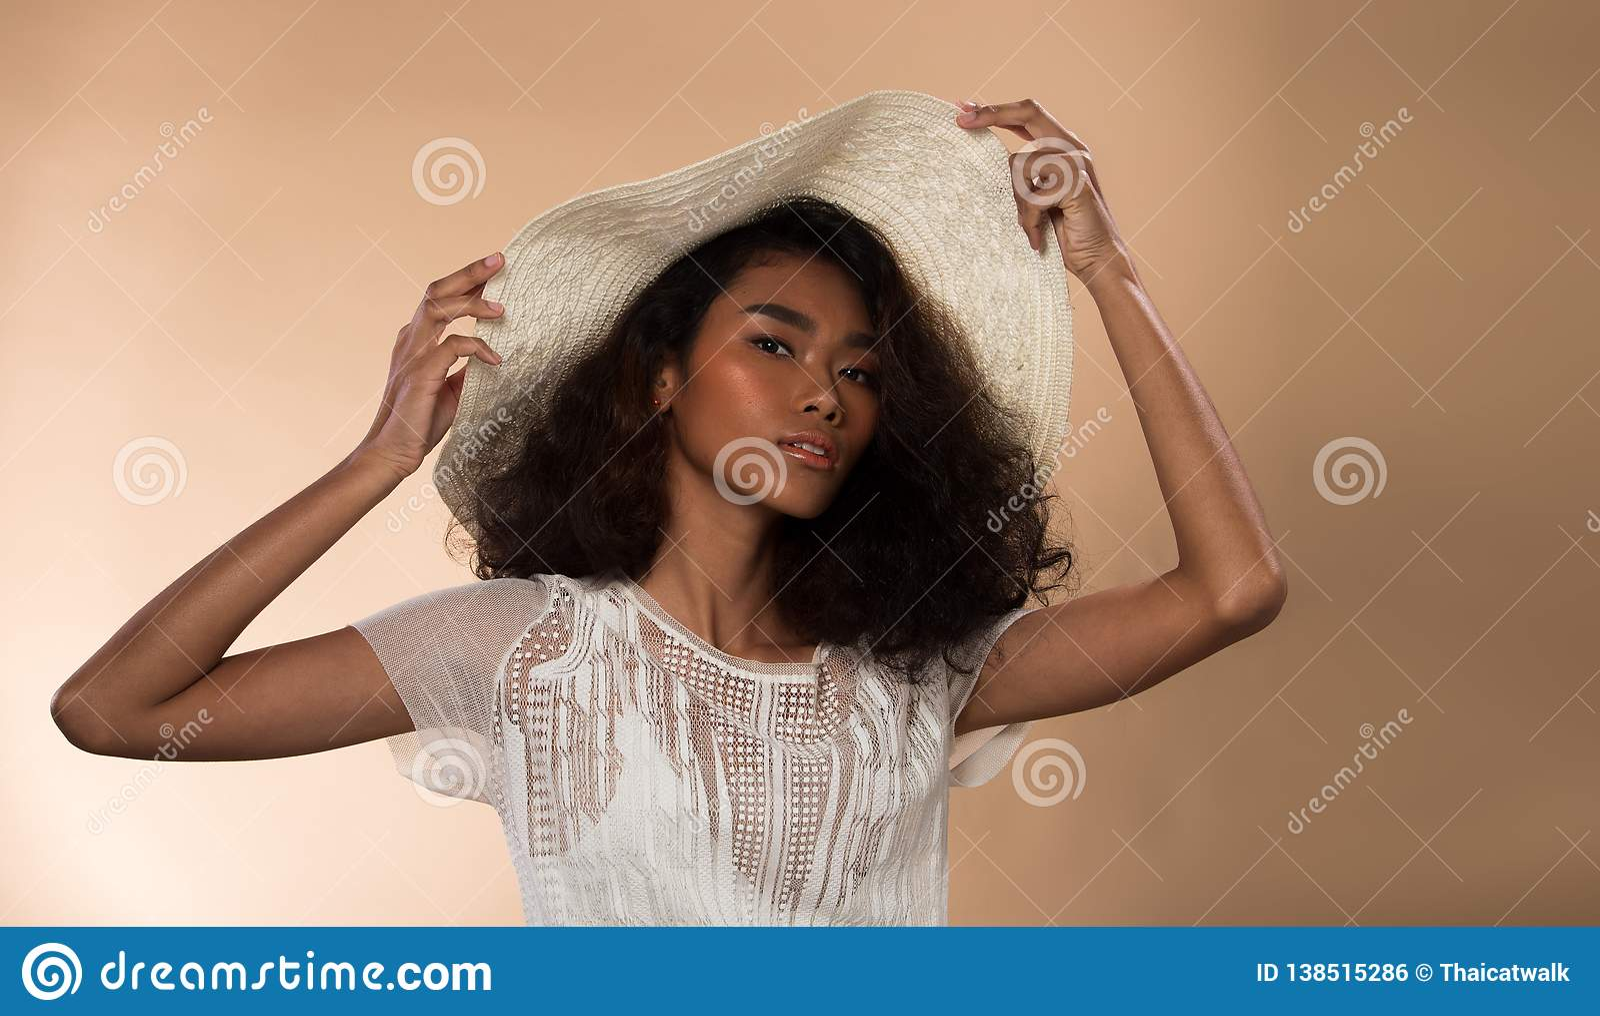 199292700 Fashion Asian Woman Tan Skin Black Hair Eyes Stock Photo - Image of ...